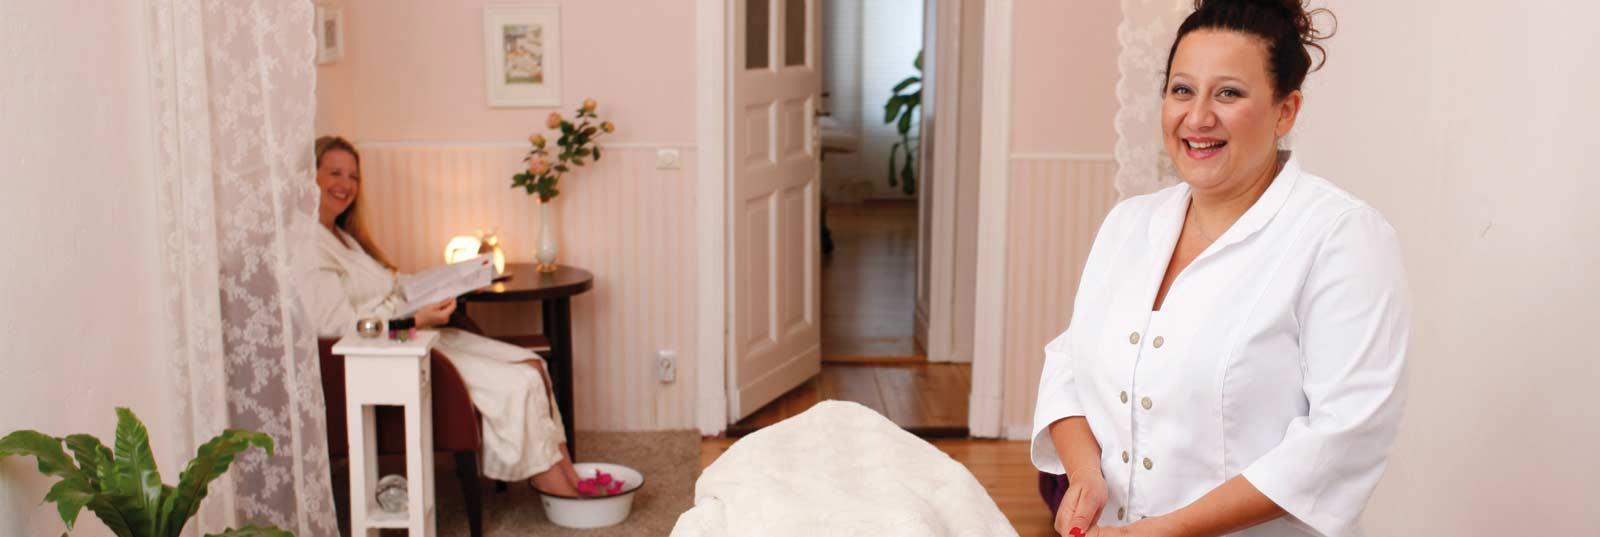 massage naturkosmetik berlin prenzlauer berg sch nerie massage naturkosmetik berlin mitte. Black Bedroom Furniture Sets. Home Design Ideas